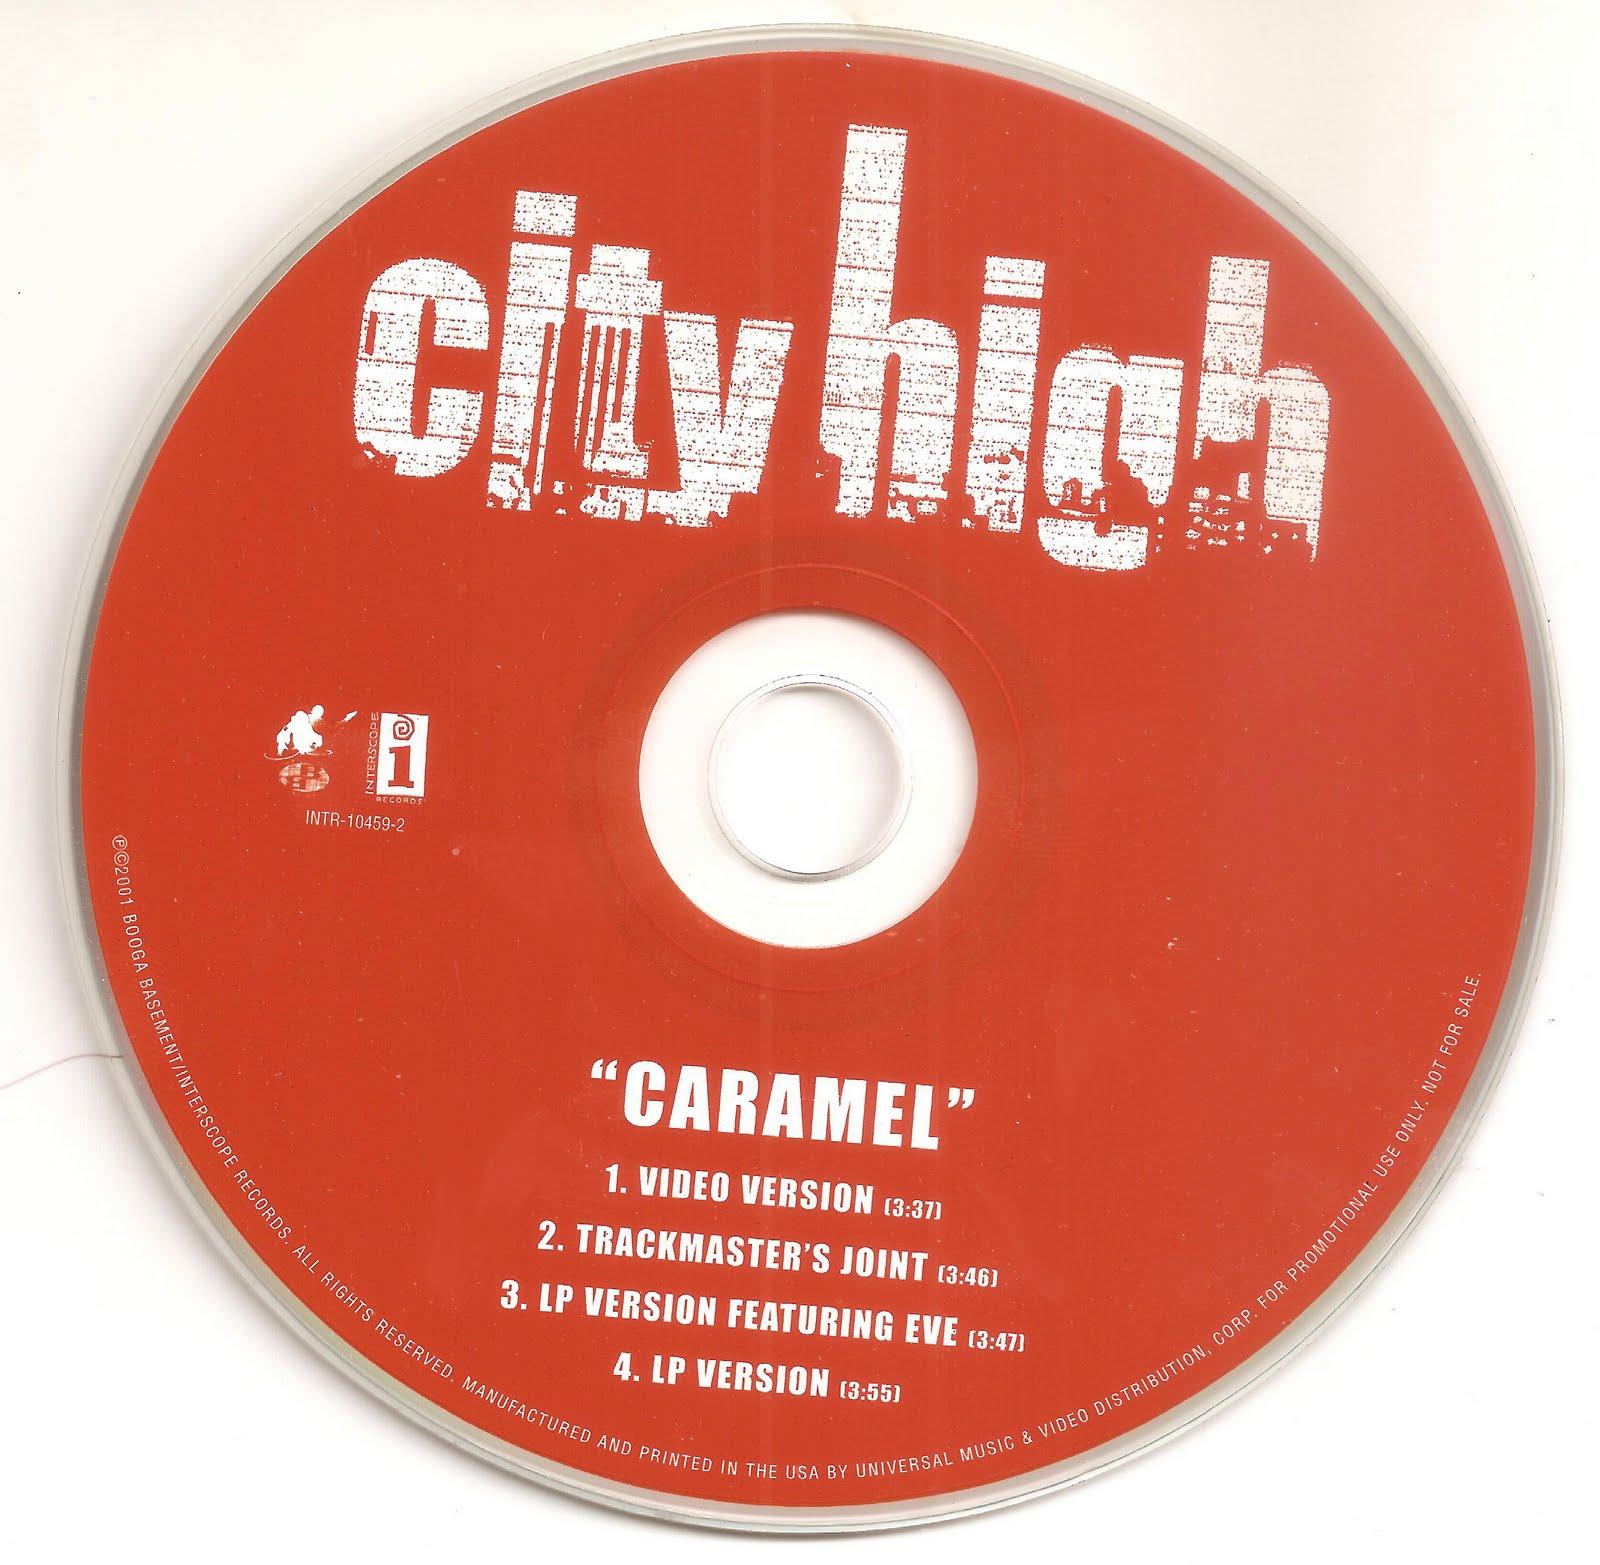 http://4.bp.blogspot.com/-UKgxDKWxpUE/TciKgEjlzbI/AAAAAAAAJoE/s_RMgK6OXnE/s1600/00-city_high-caramel-%252528promo_cds%252529-2001-cd.jpg